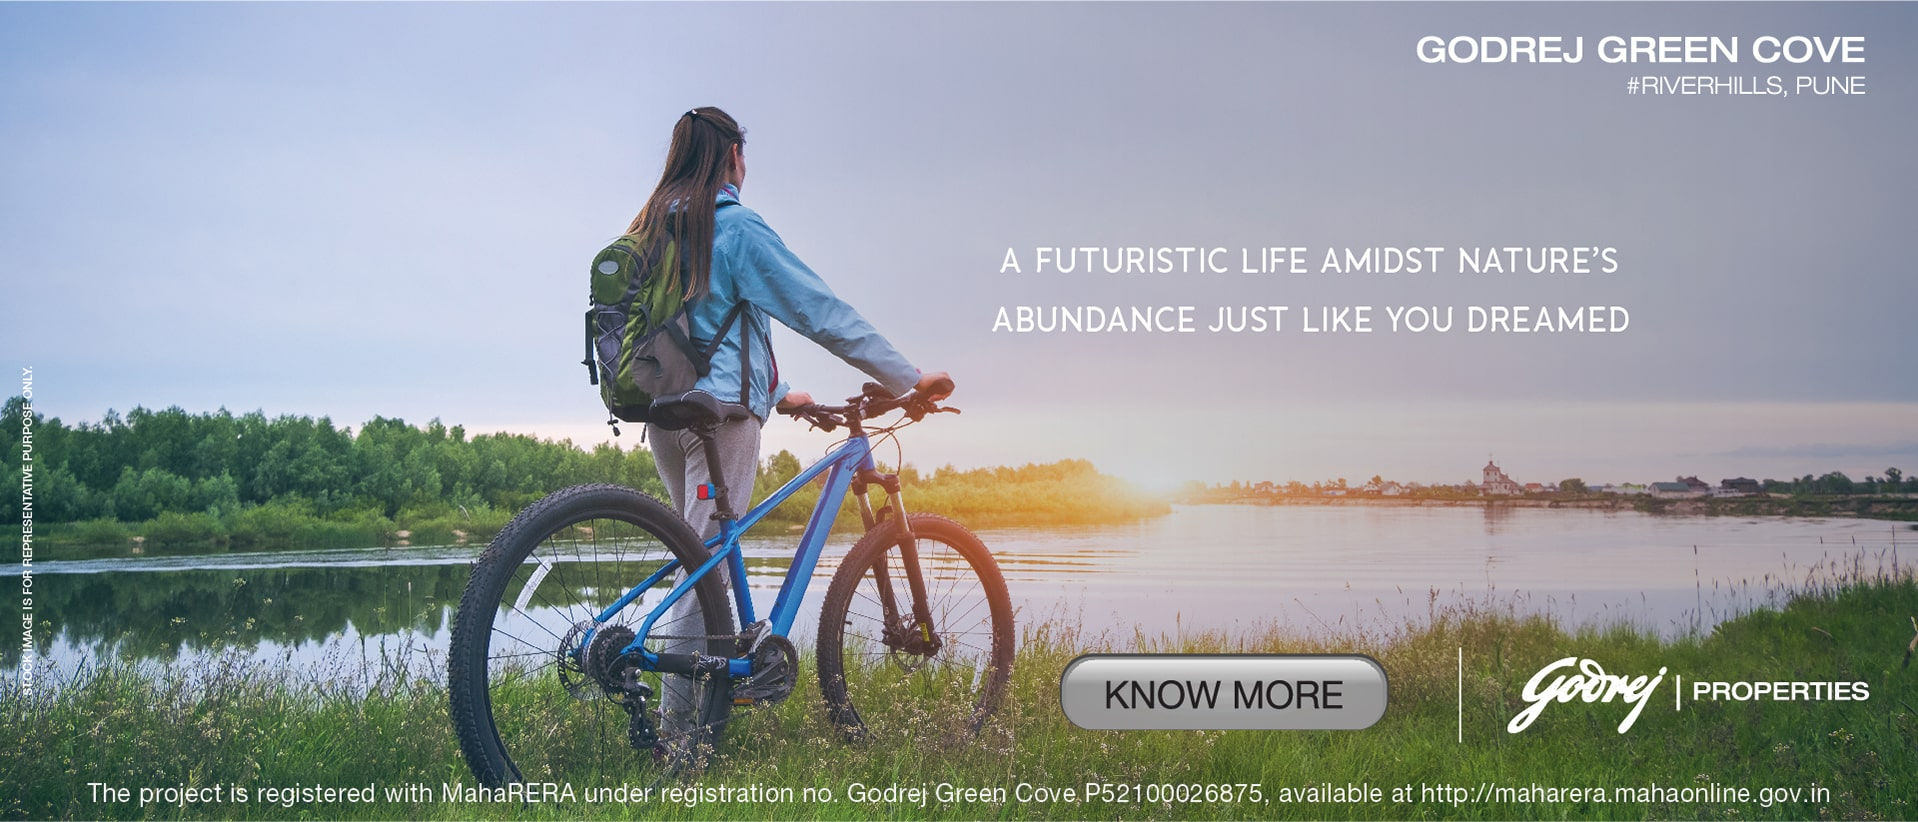 Godrej Green Cove, Pune